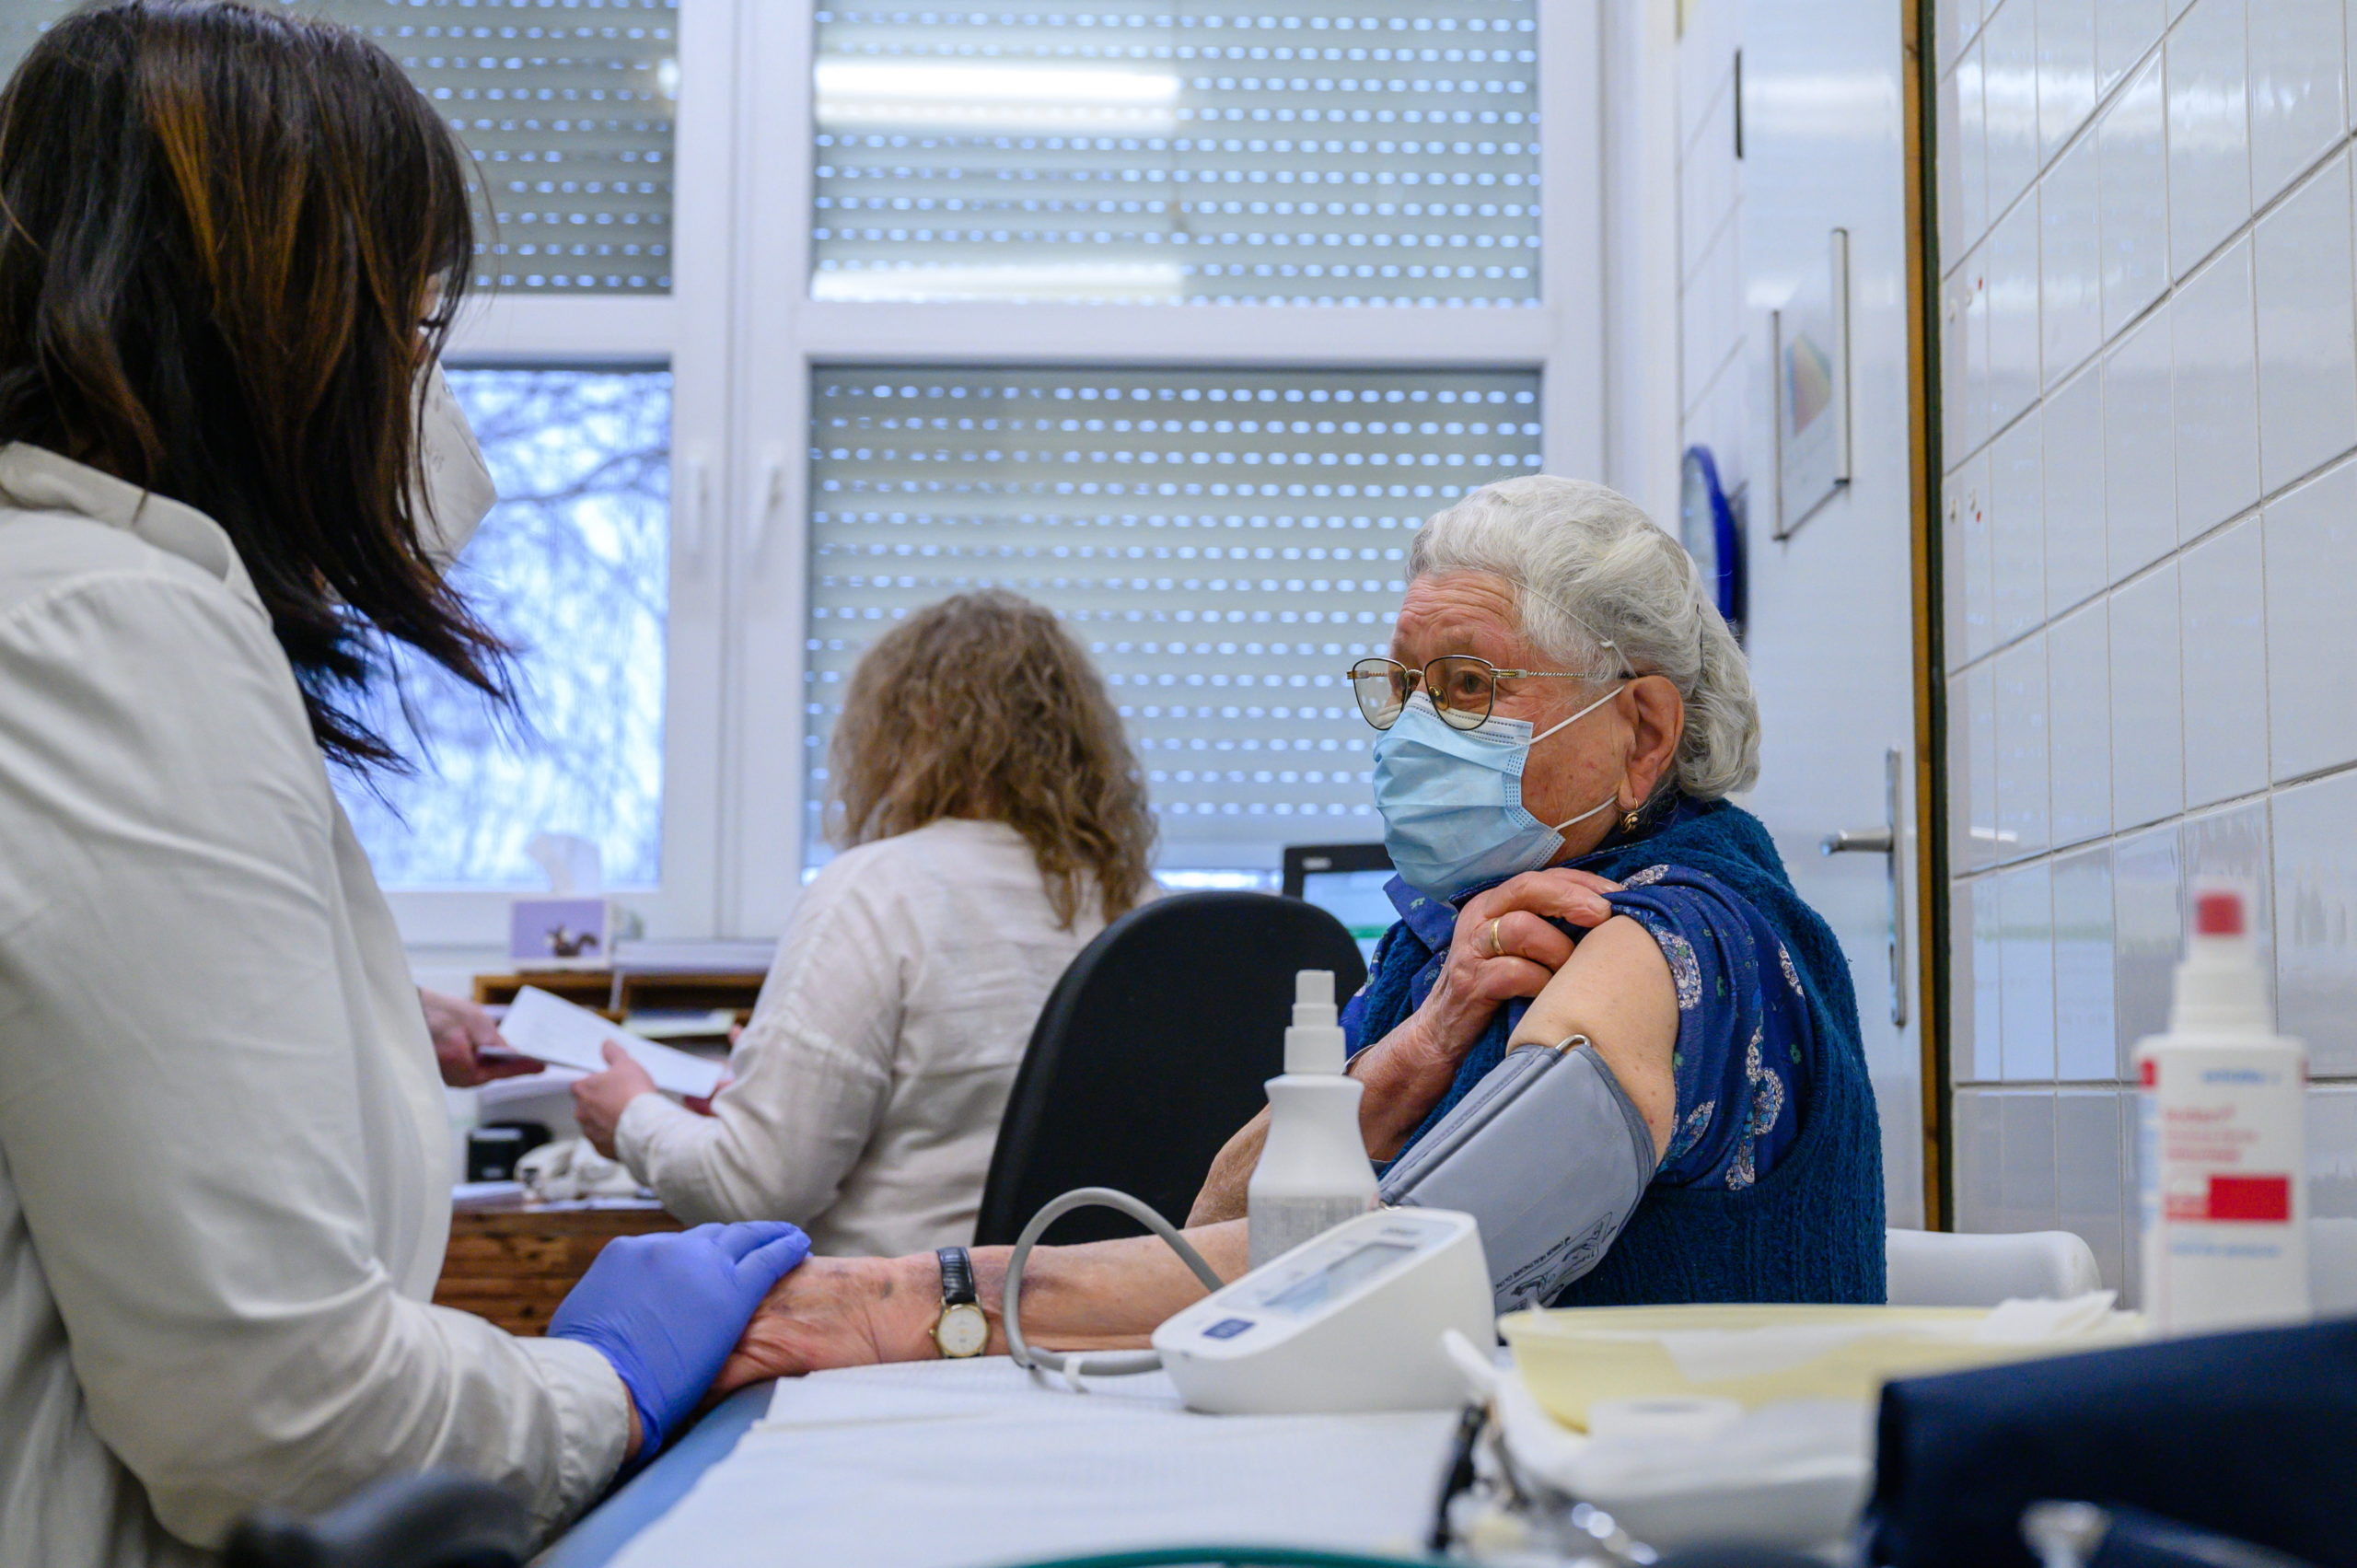 koronavírus vakcina astrazeneca